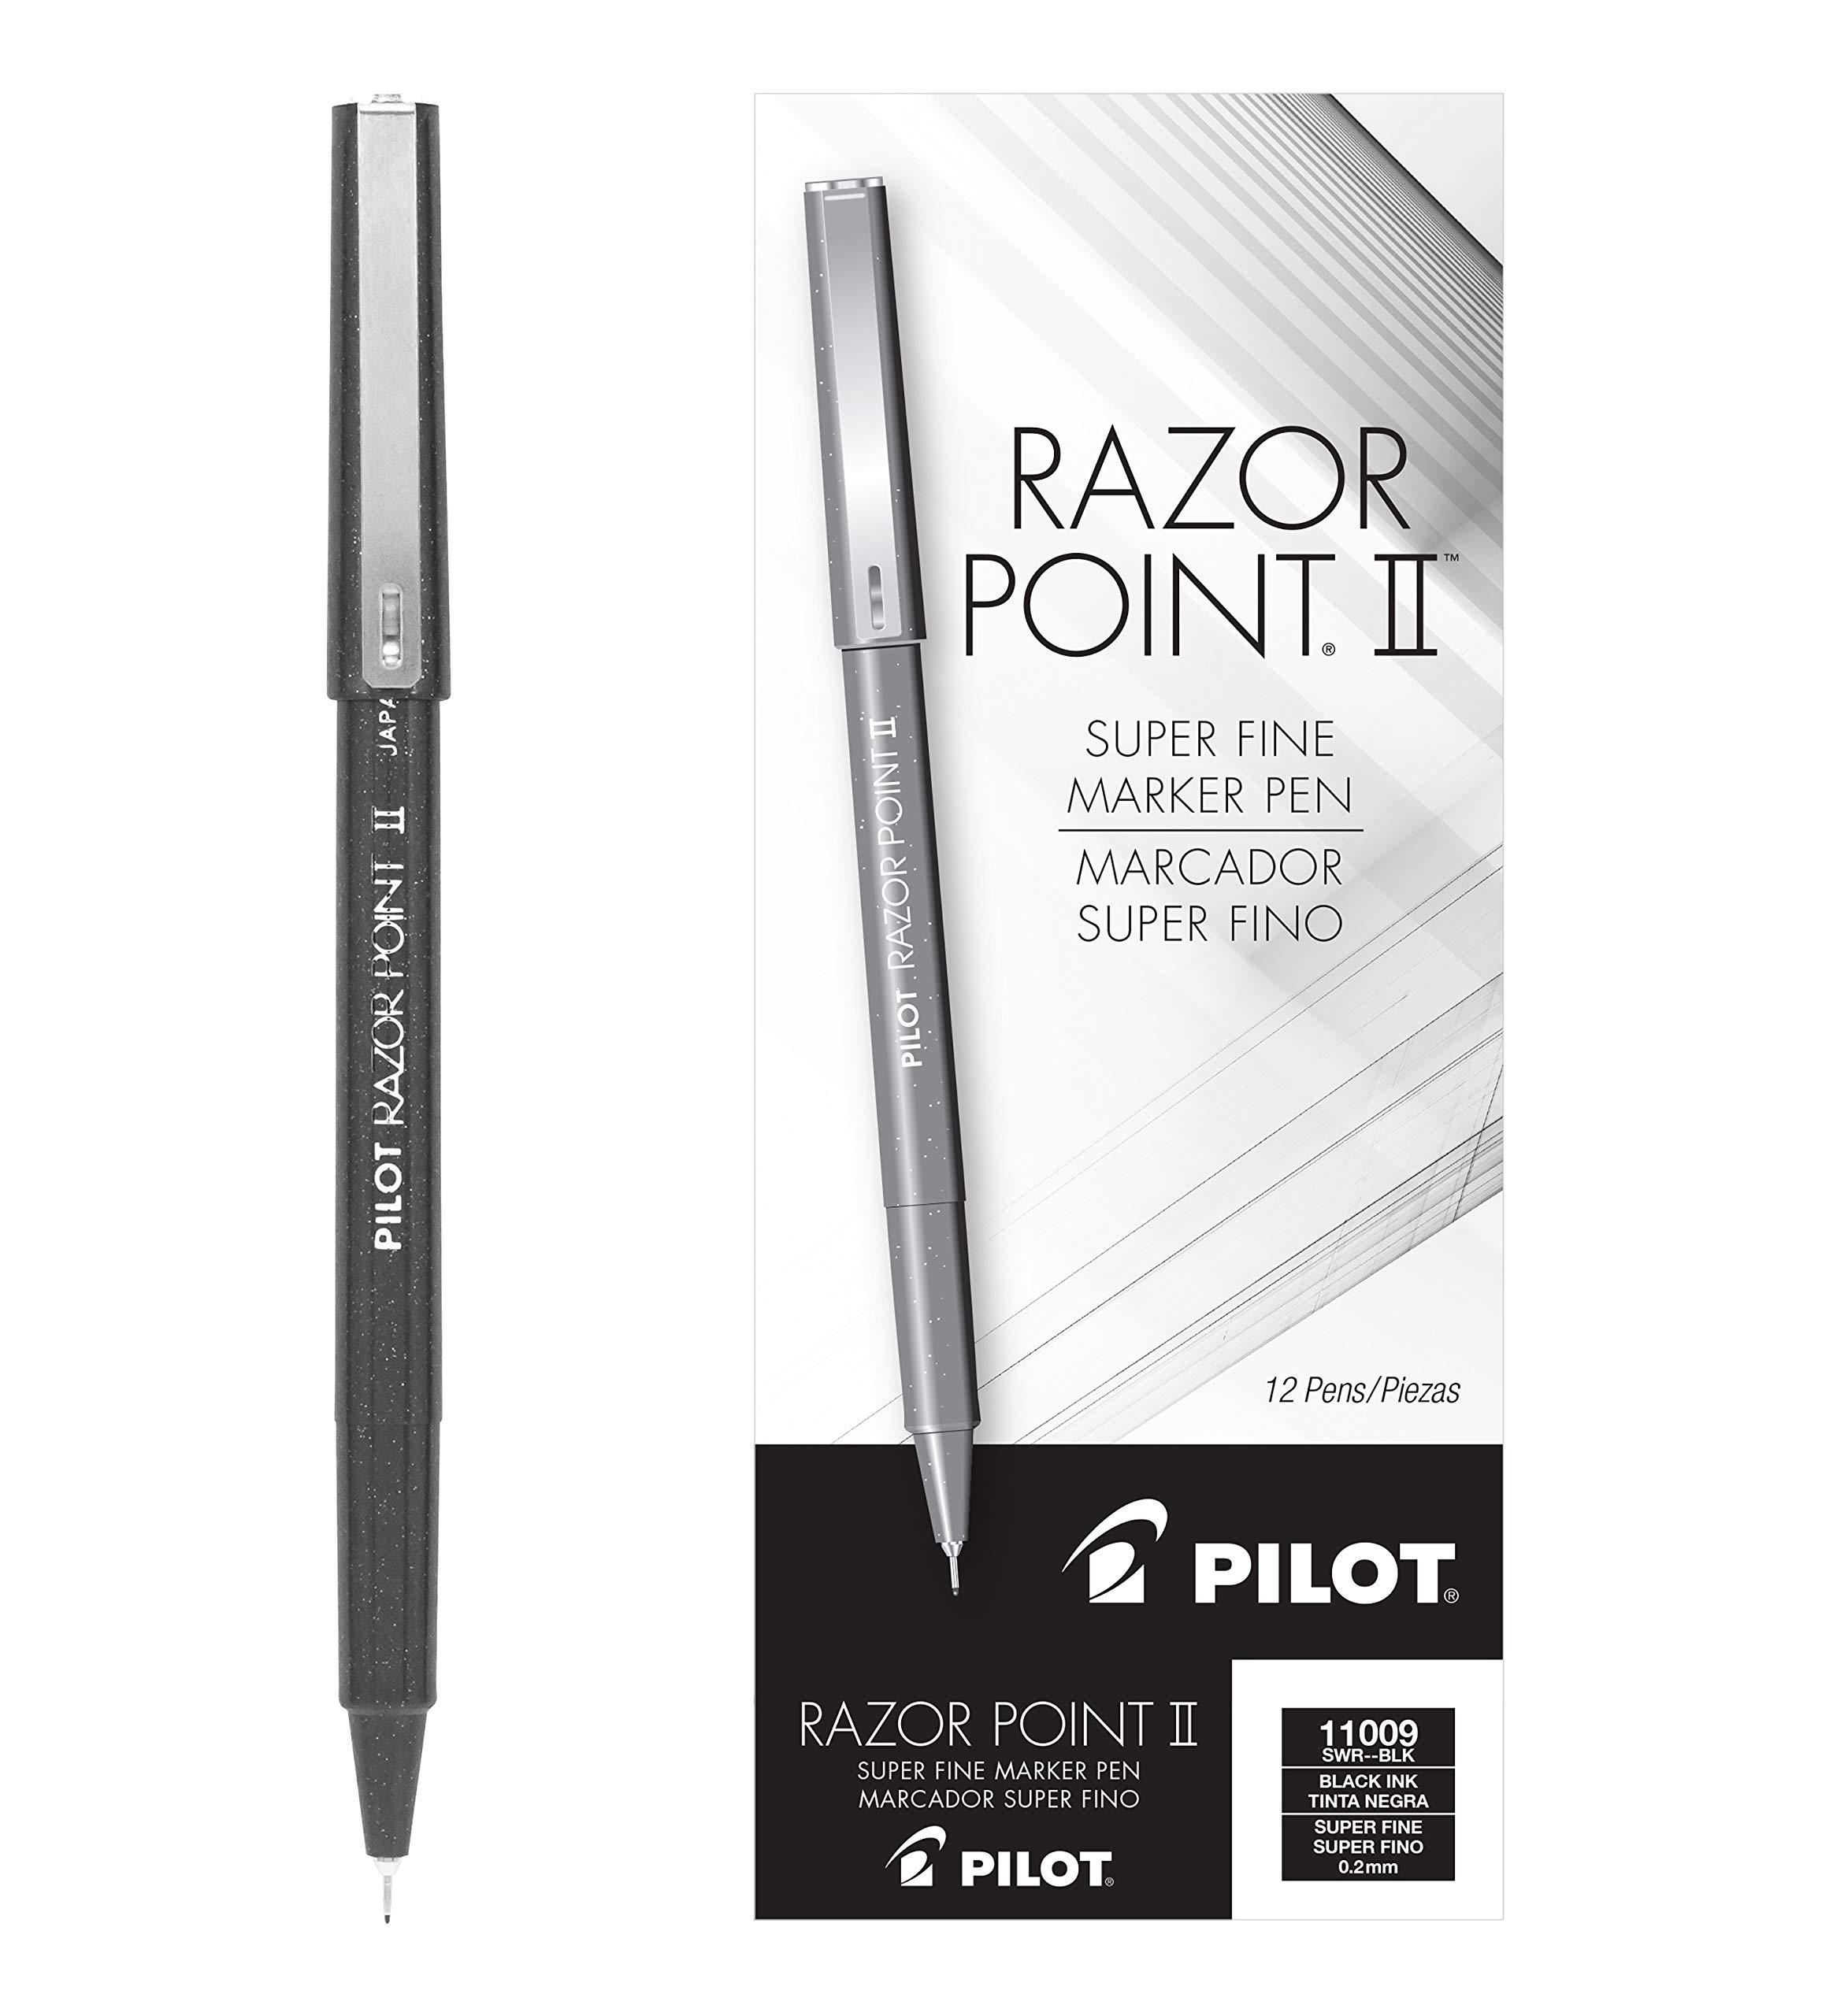 PILOT Razor Point II Fine Line Marker Stick Pens, Super Fine Point (0.2mm) Black Ink, Dozen Box (11009) by Pilot